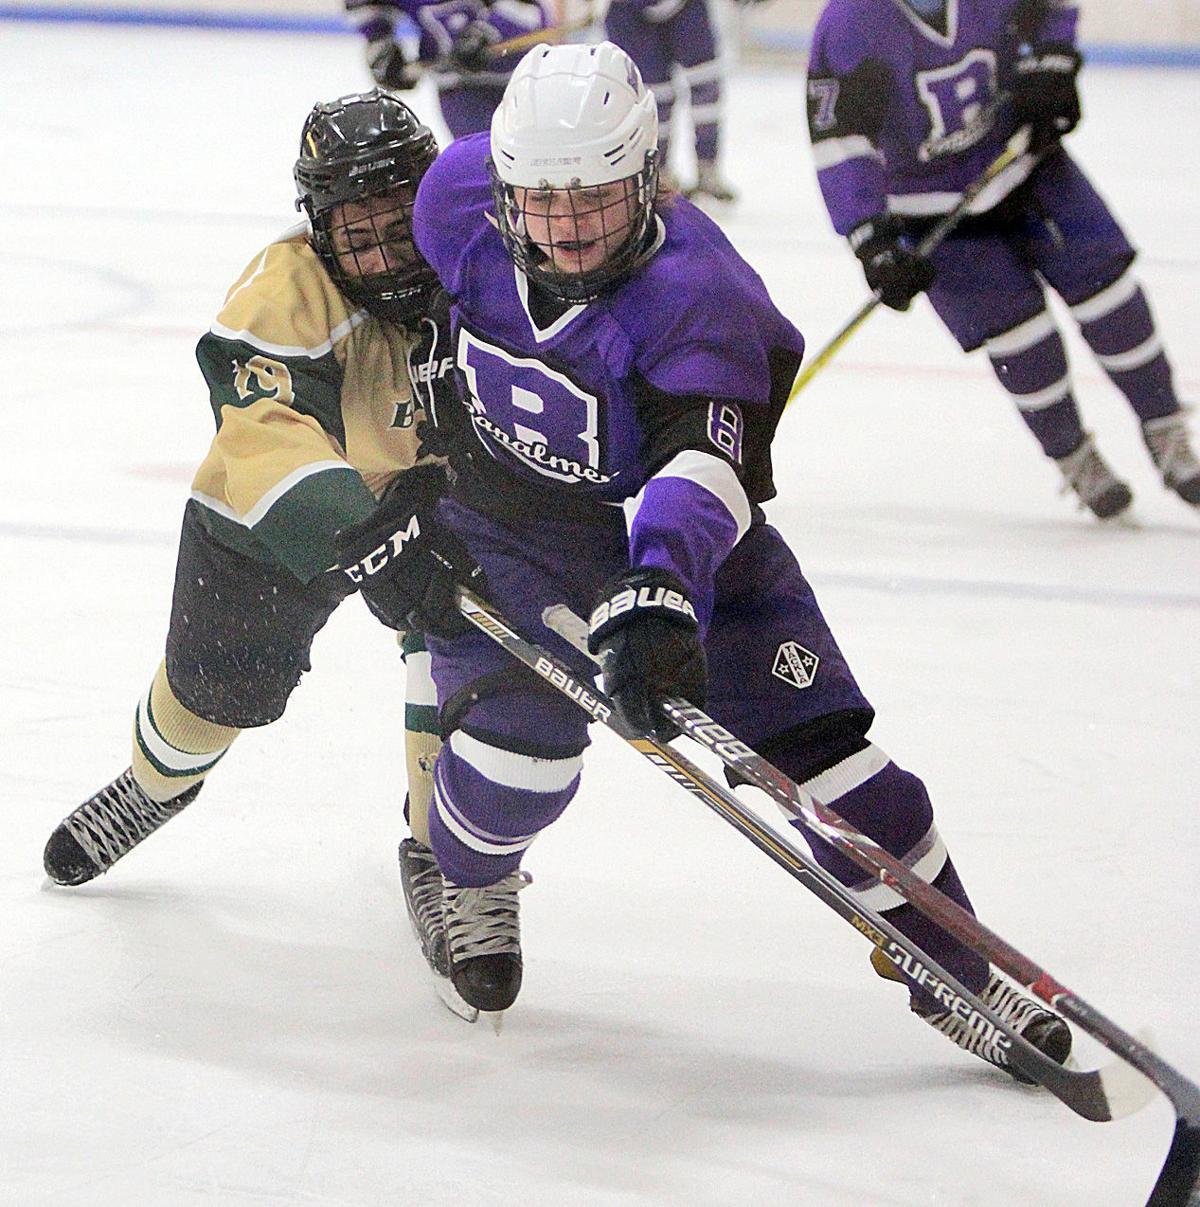 Bourne Boys' Hockey vs. GNB Voc-Tech - January 12, 2019